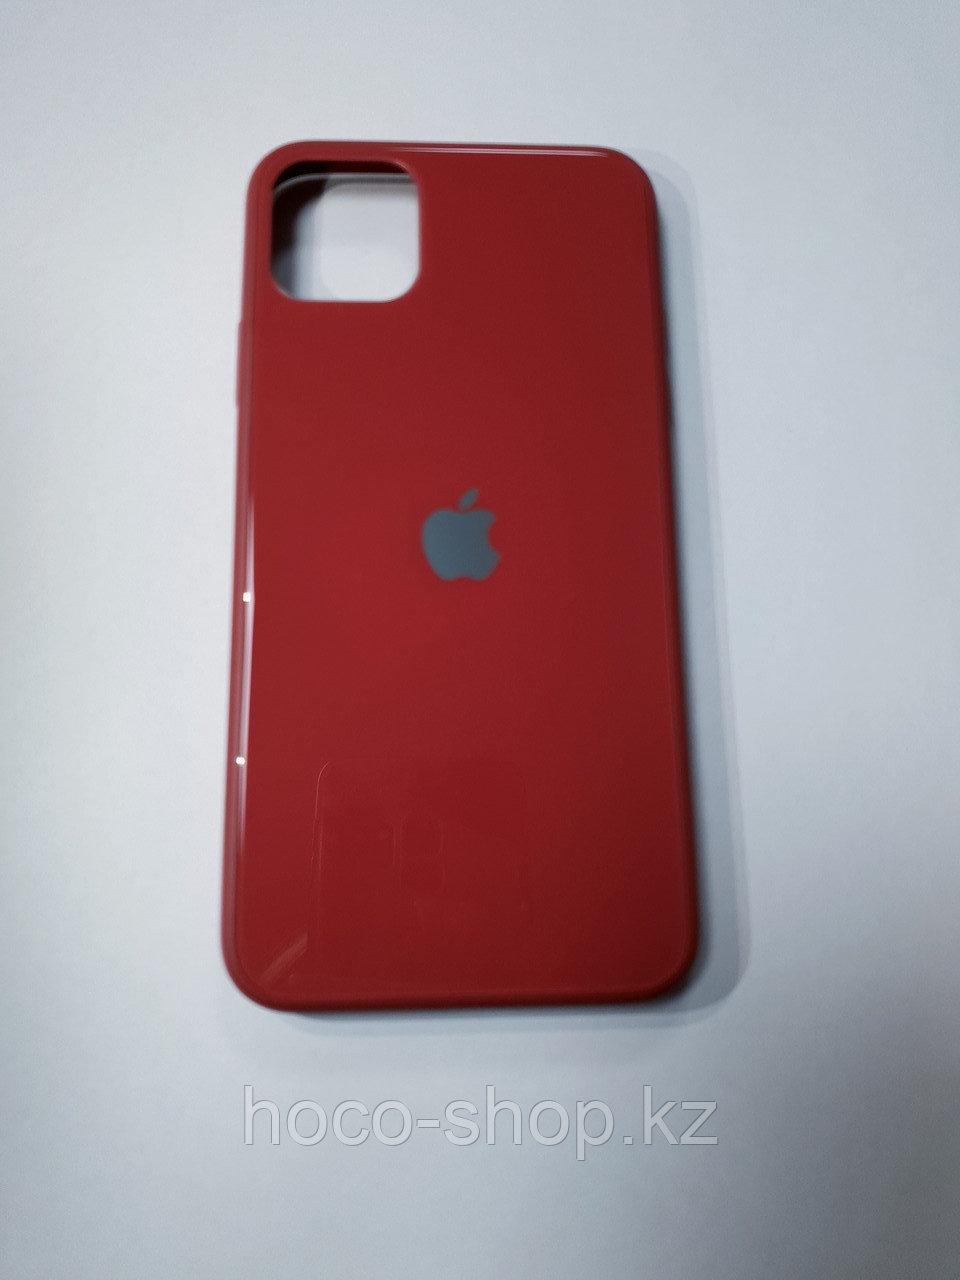 Противоударный чехол Macome iPhone 11